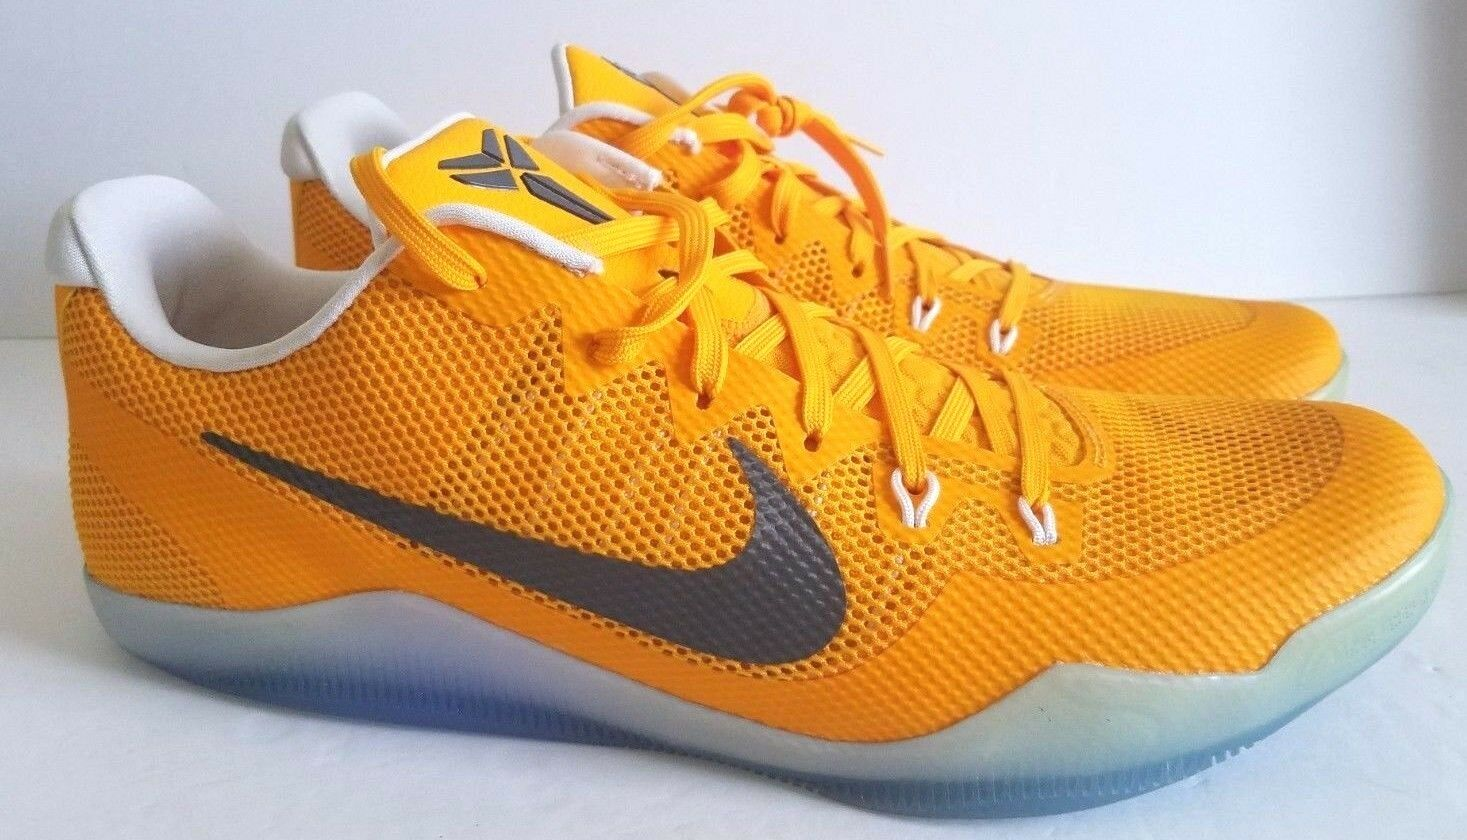 Nike Mens Kobe XI TB Promo University gold Basketball shoes 856485 771 Size 17